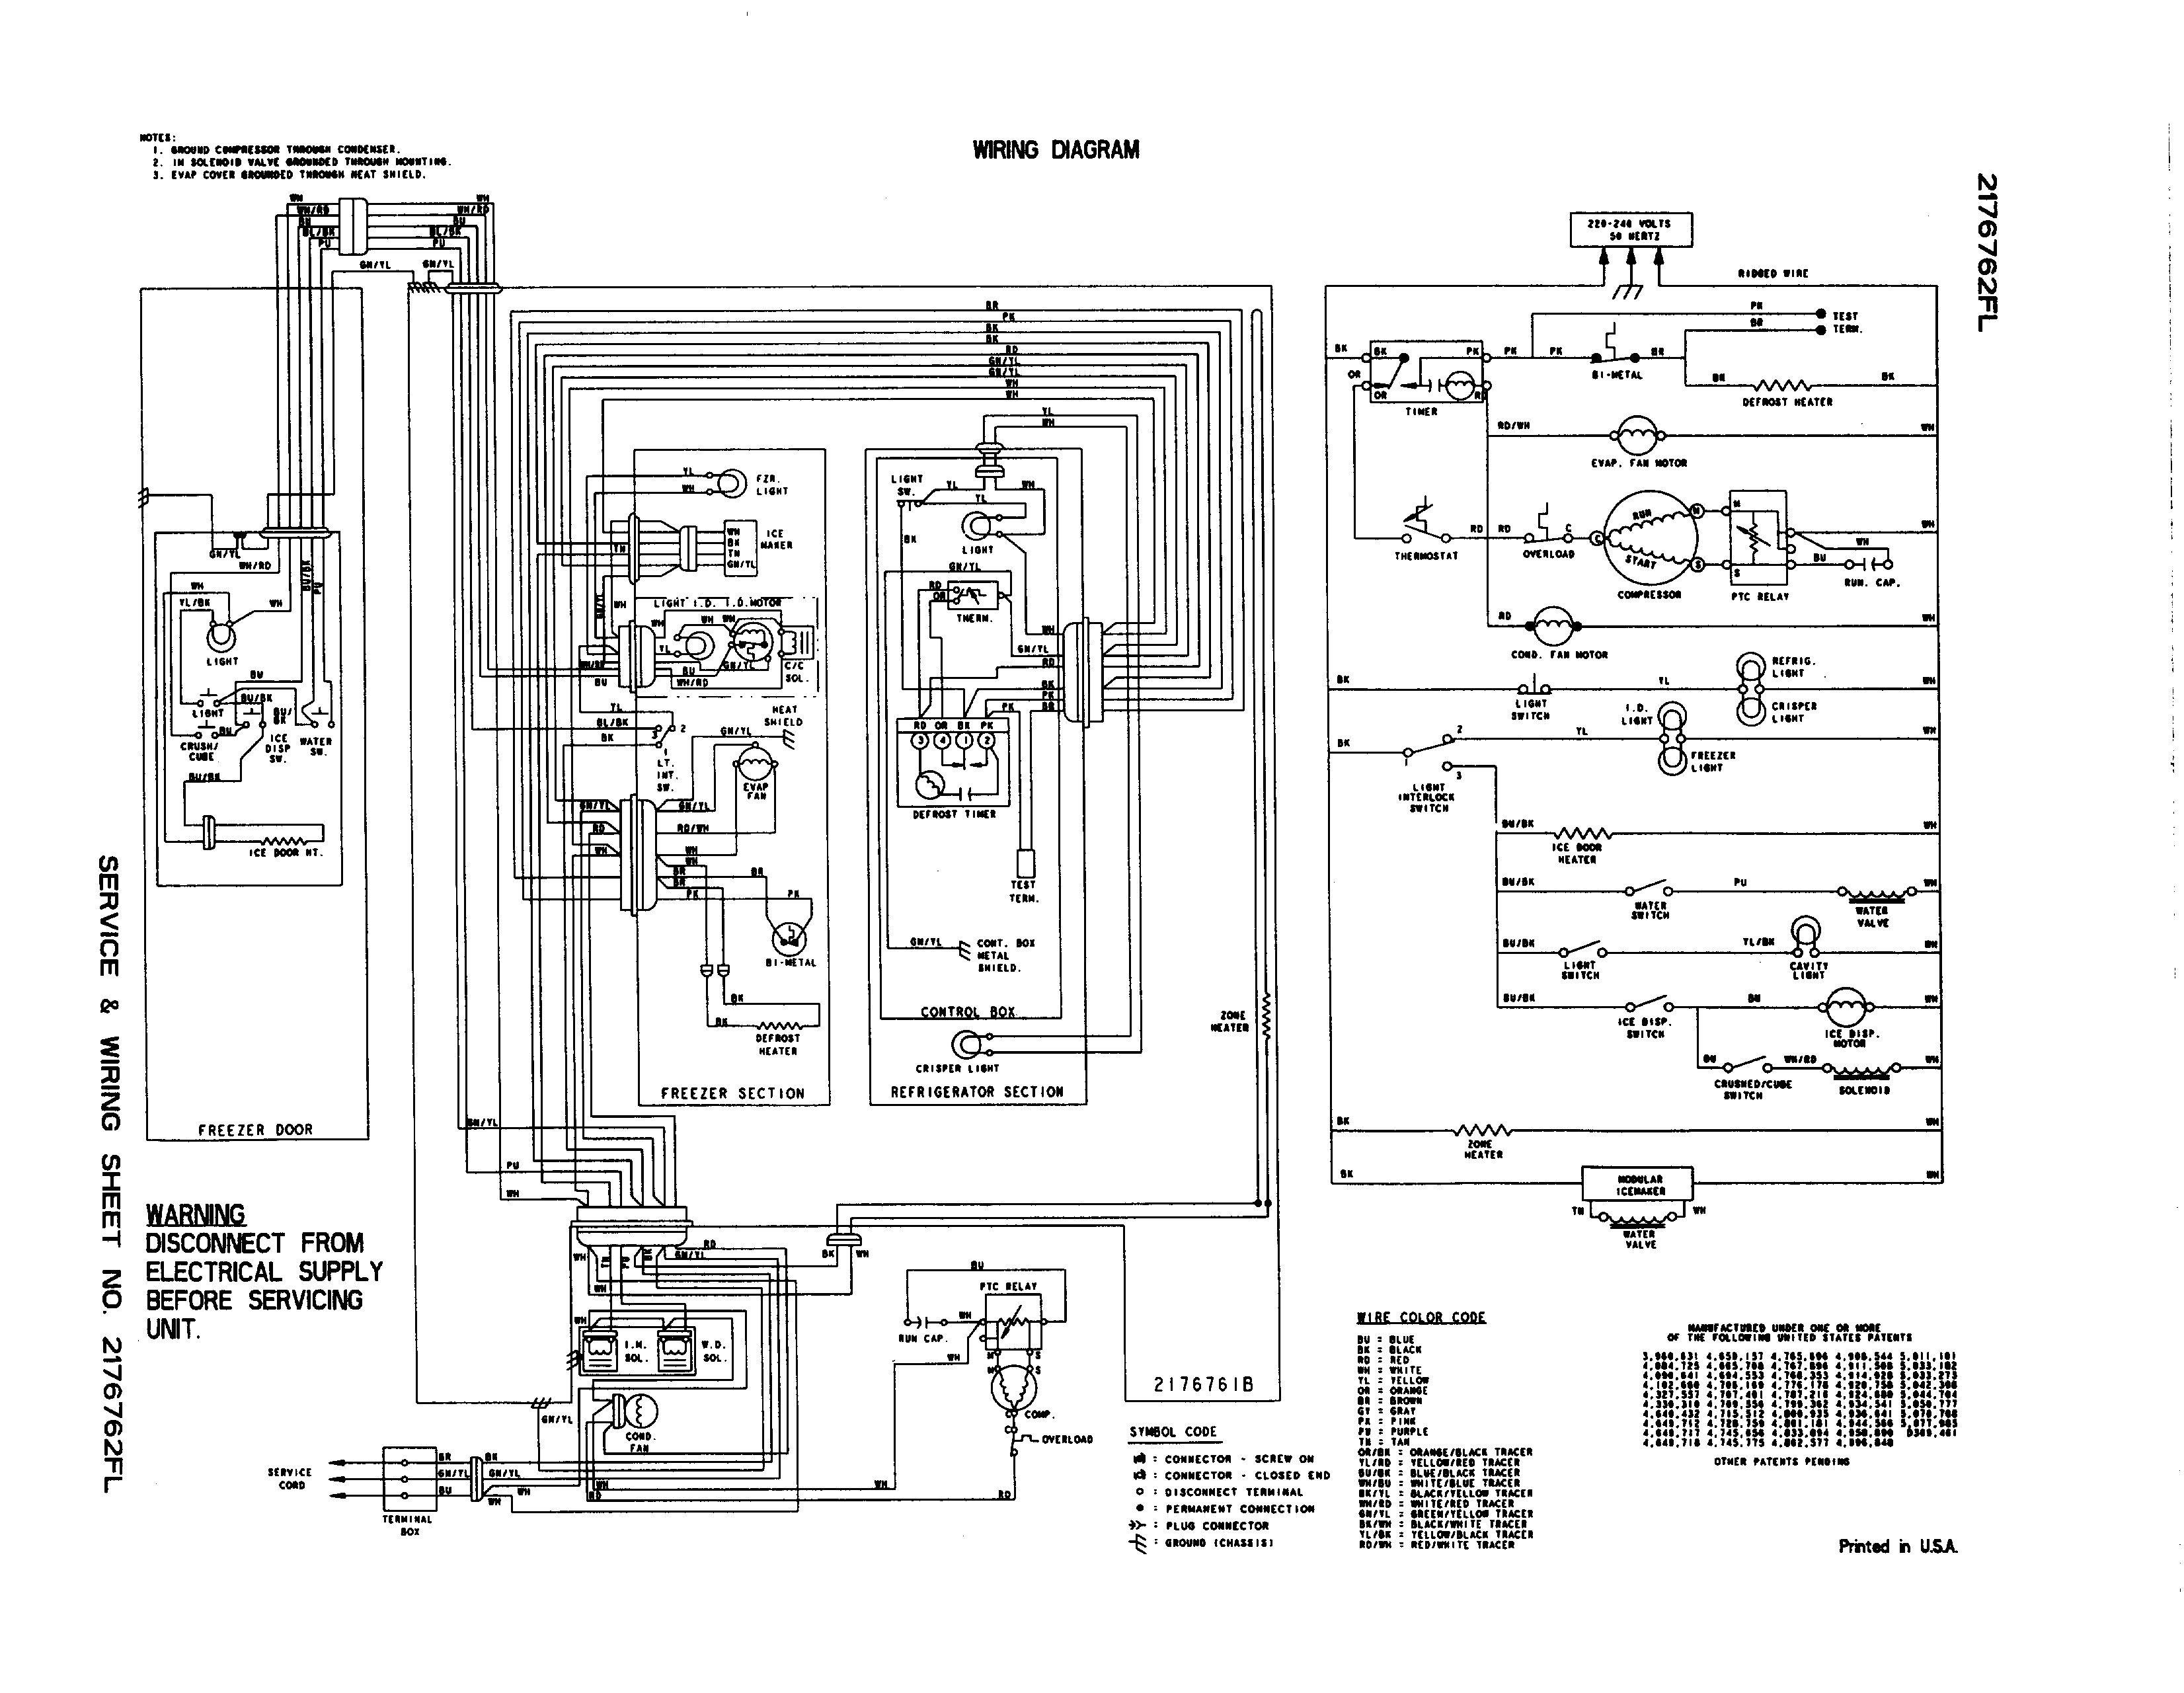 Whirlpool Microwave Wmh32519fb0 Wiring Diagram